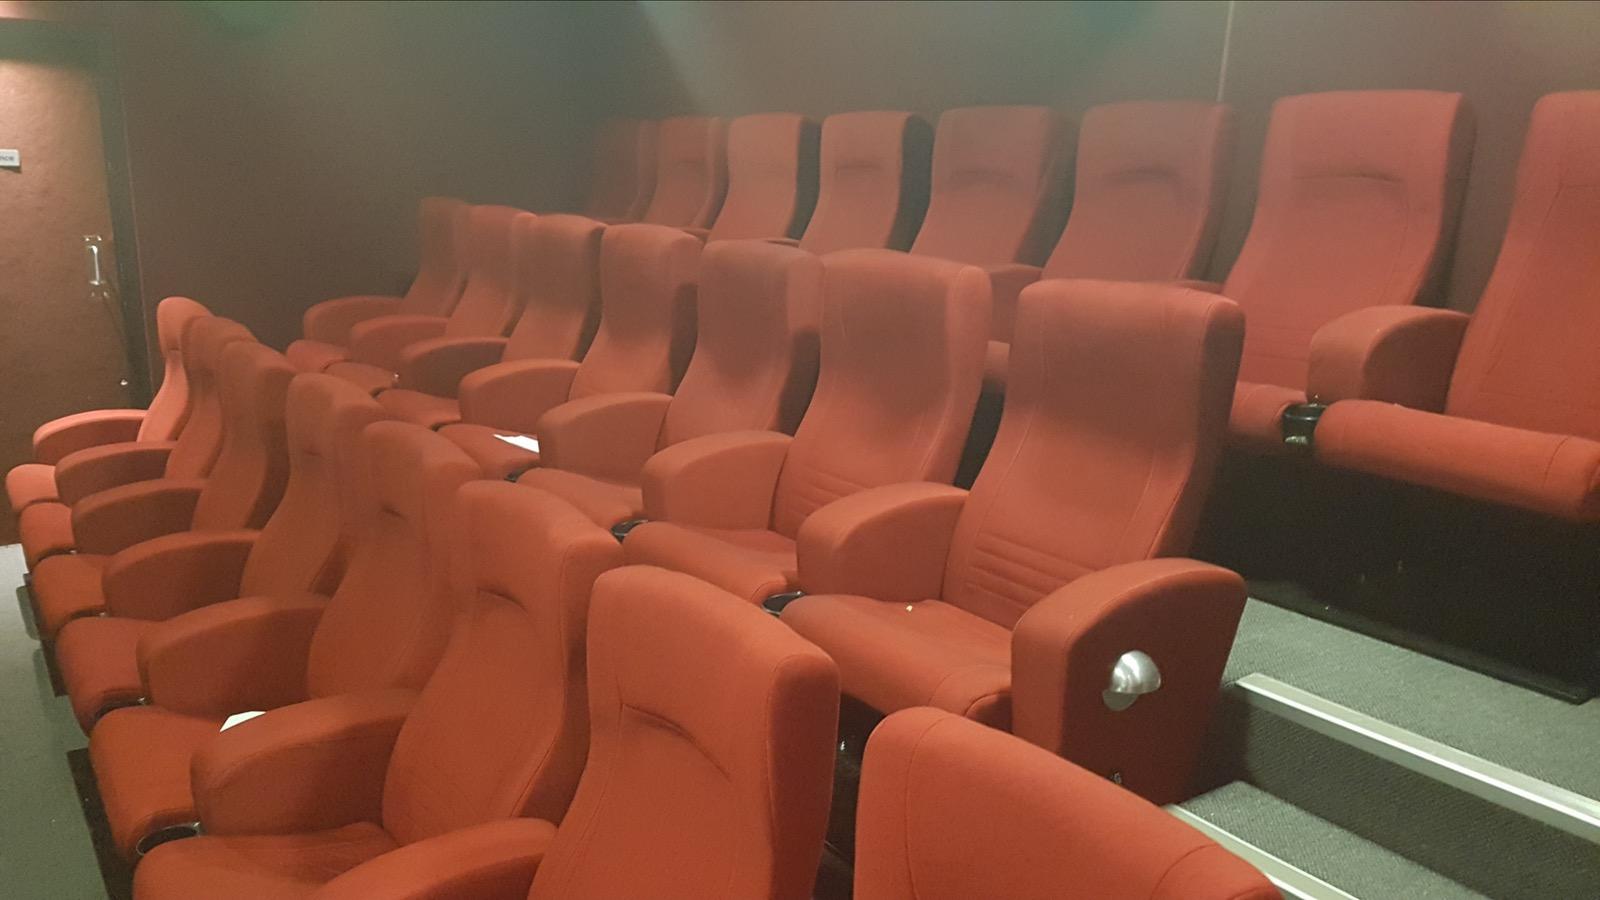 The upstats seating